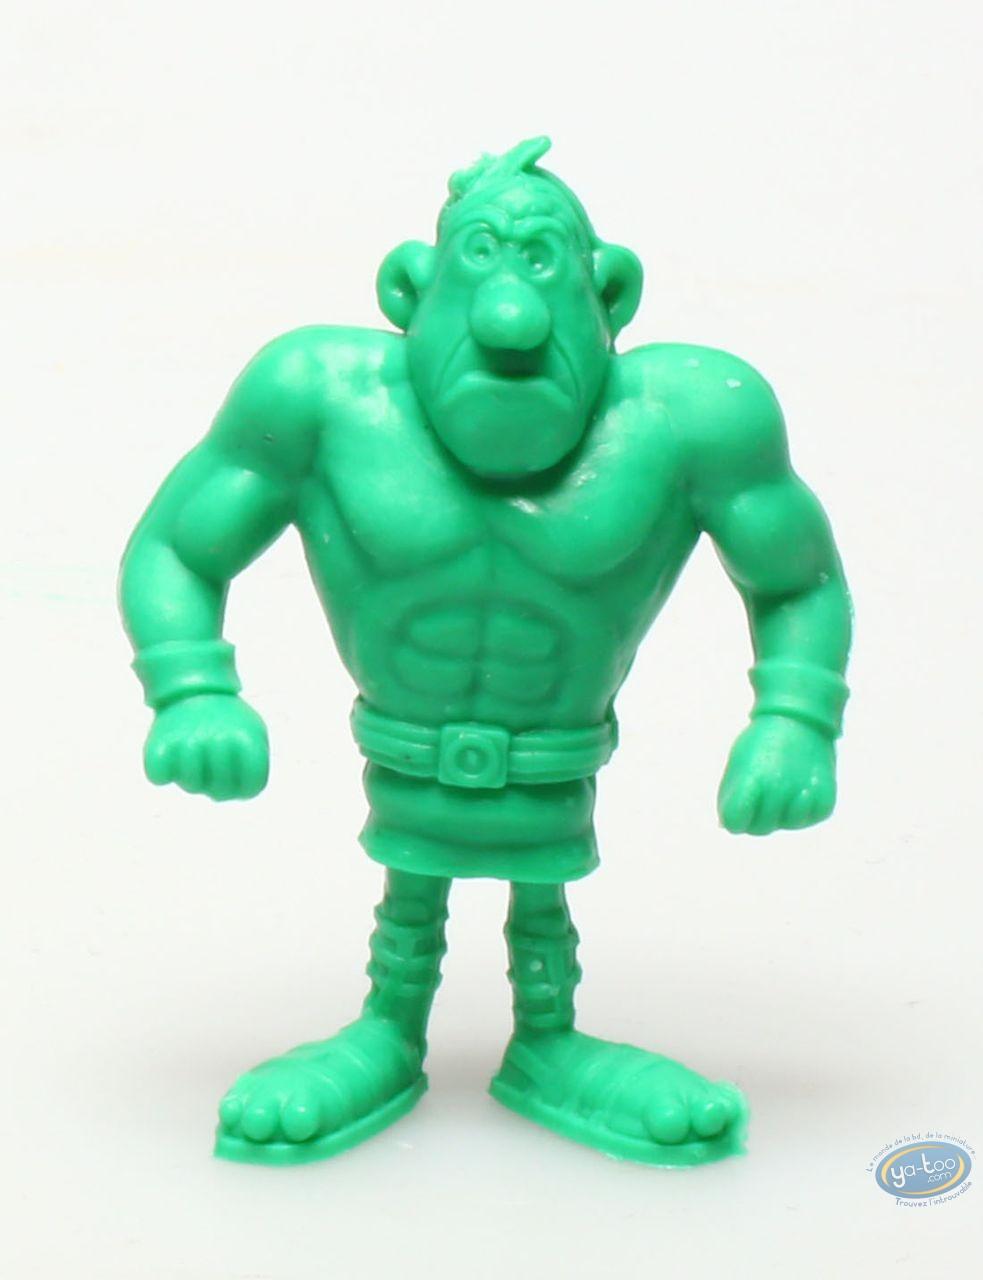 Figurine plastique, Astérix : Mini Cornedurus (vert foncé)